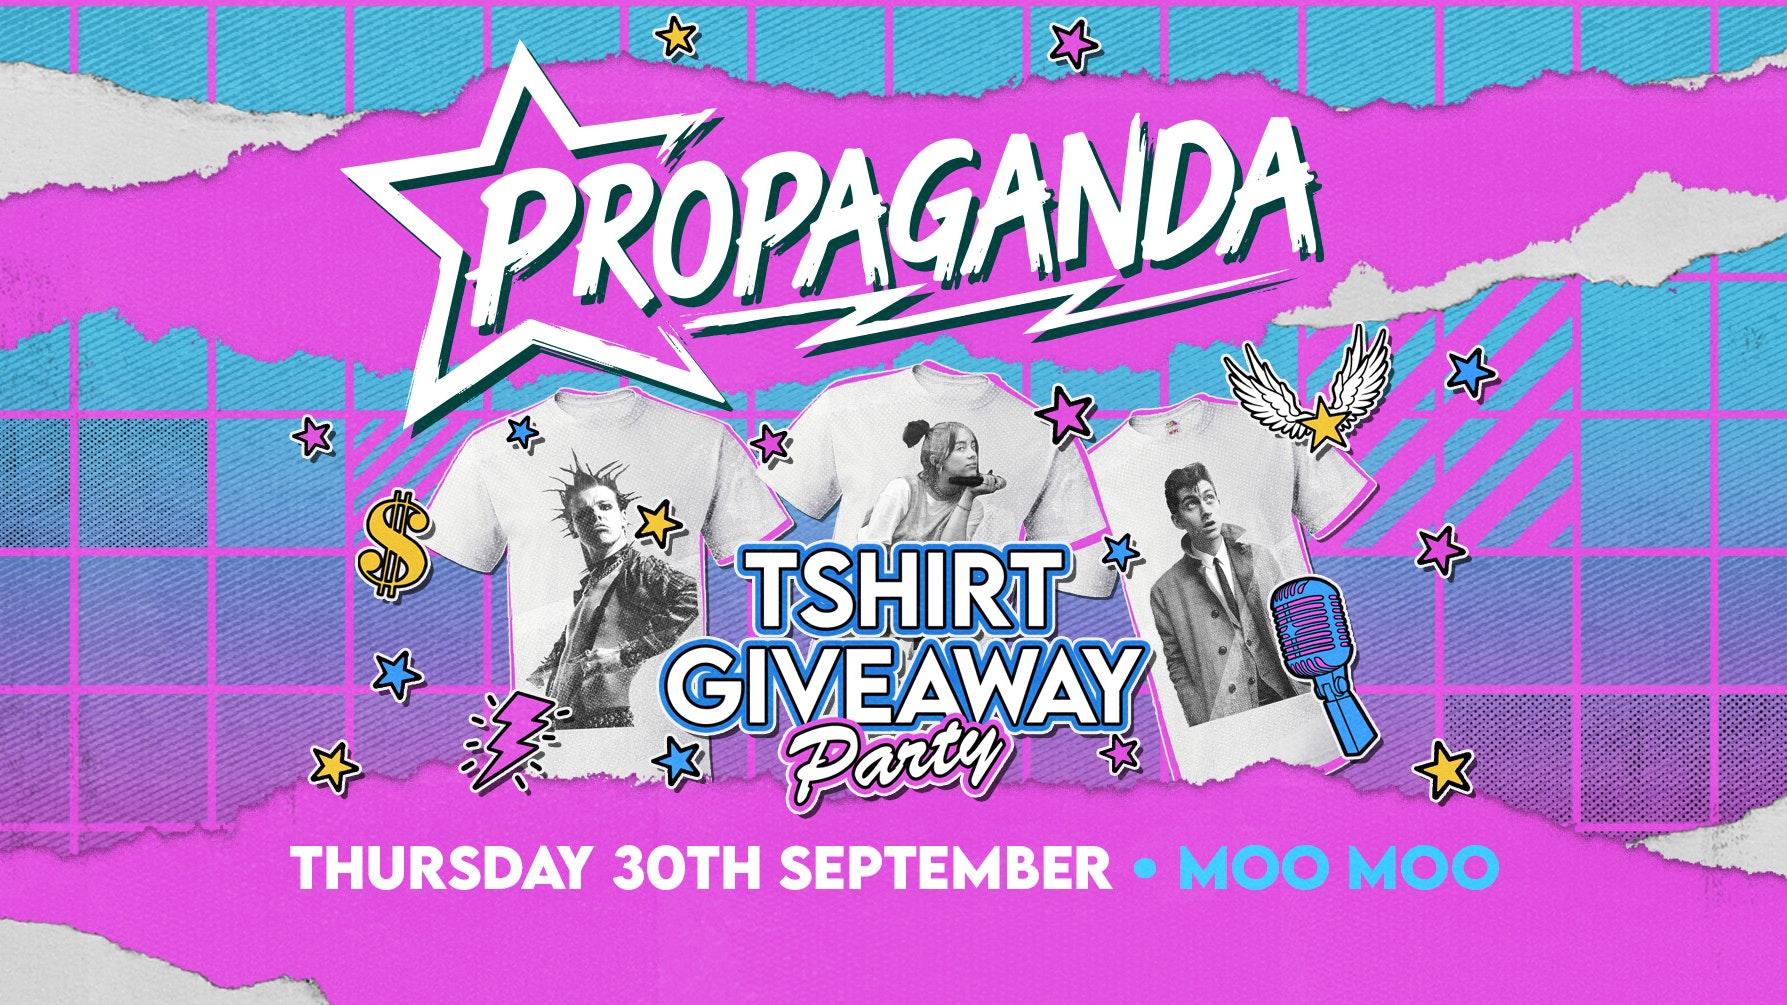 Propaganda Cheltenham – T-Shirt Giveaway Party!